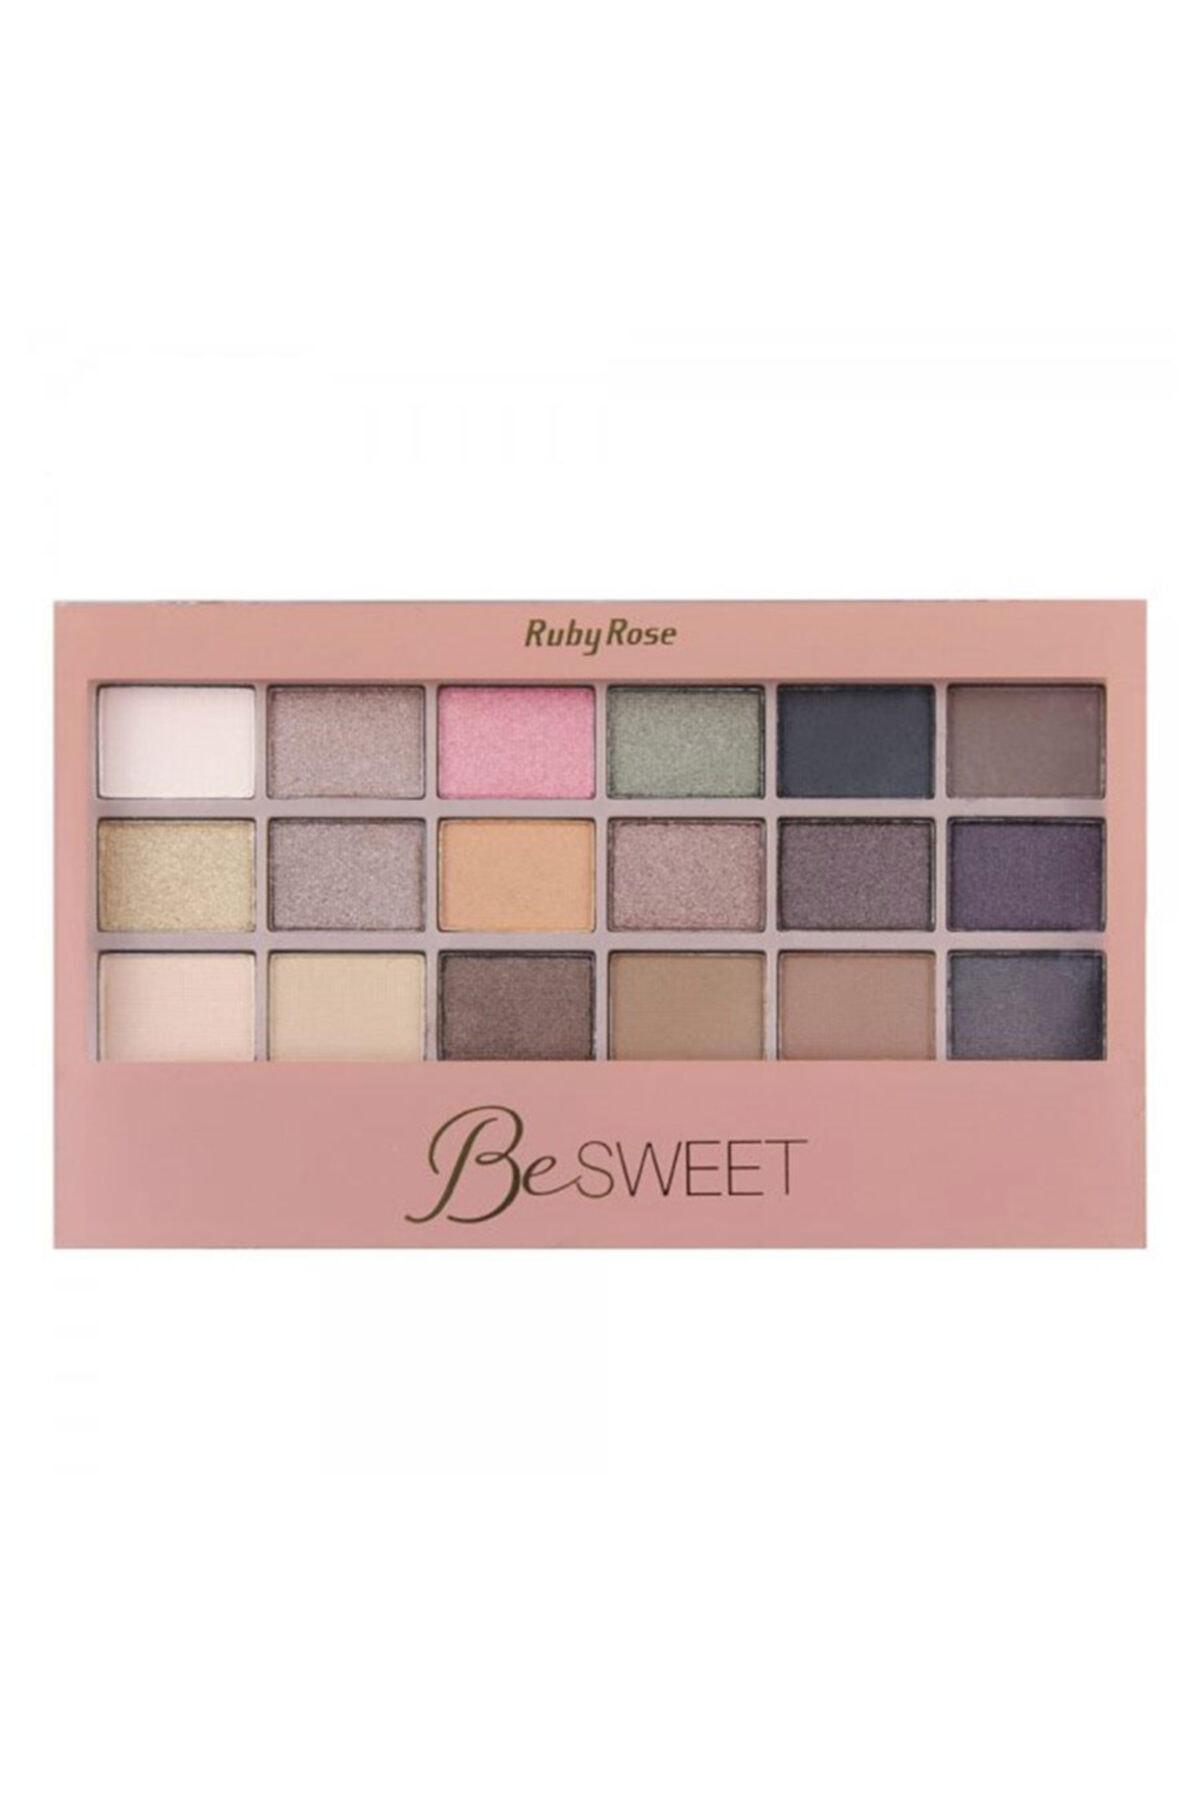 Ruby Rose Göz Farı Paleti - Eye Shadow Kit Be Sweet 6295125021083 1